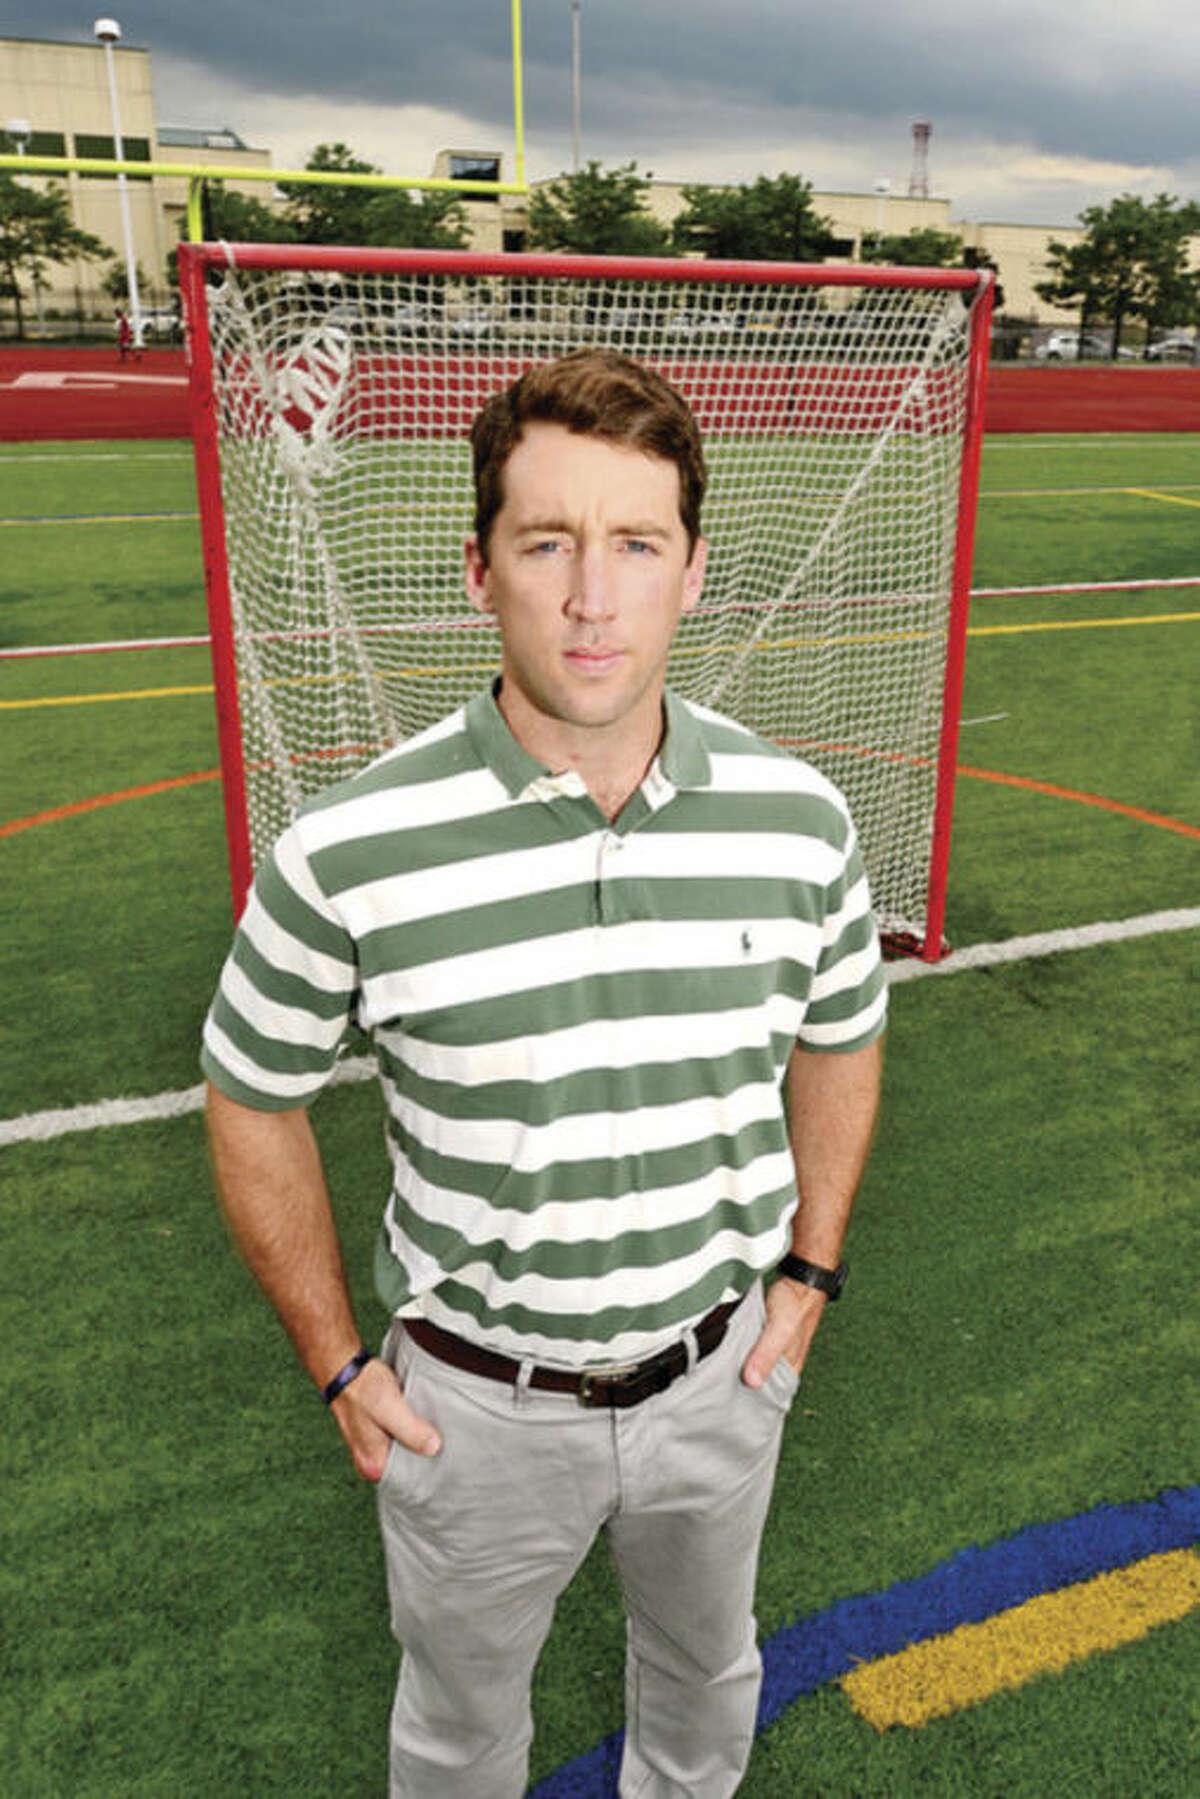 Josh Thornton, a former Weston assistant coach, has been named head coach of the Norwalk High School boys lacrosse team. @Cutline Byline:Hour photo/ Erik Trautmann